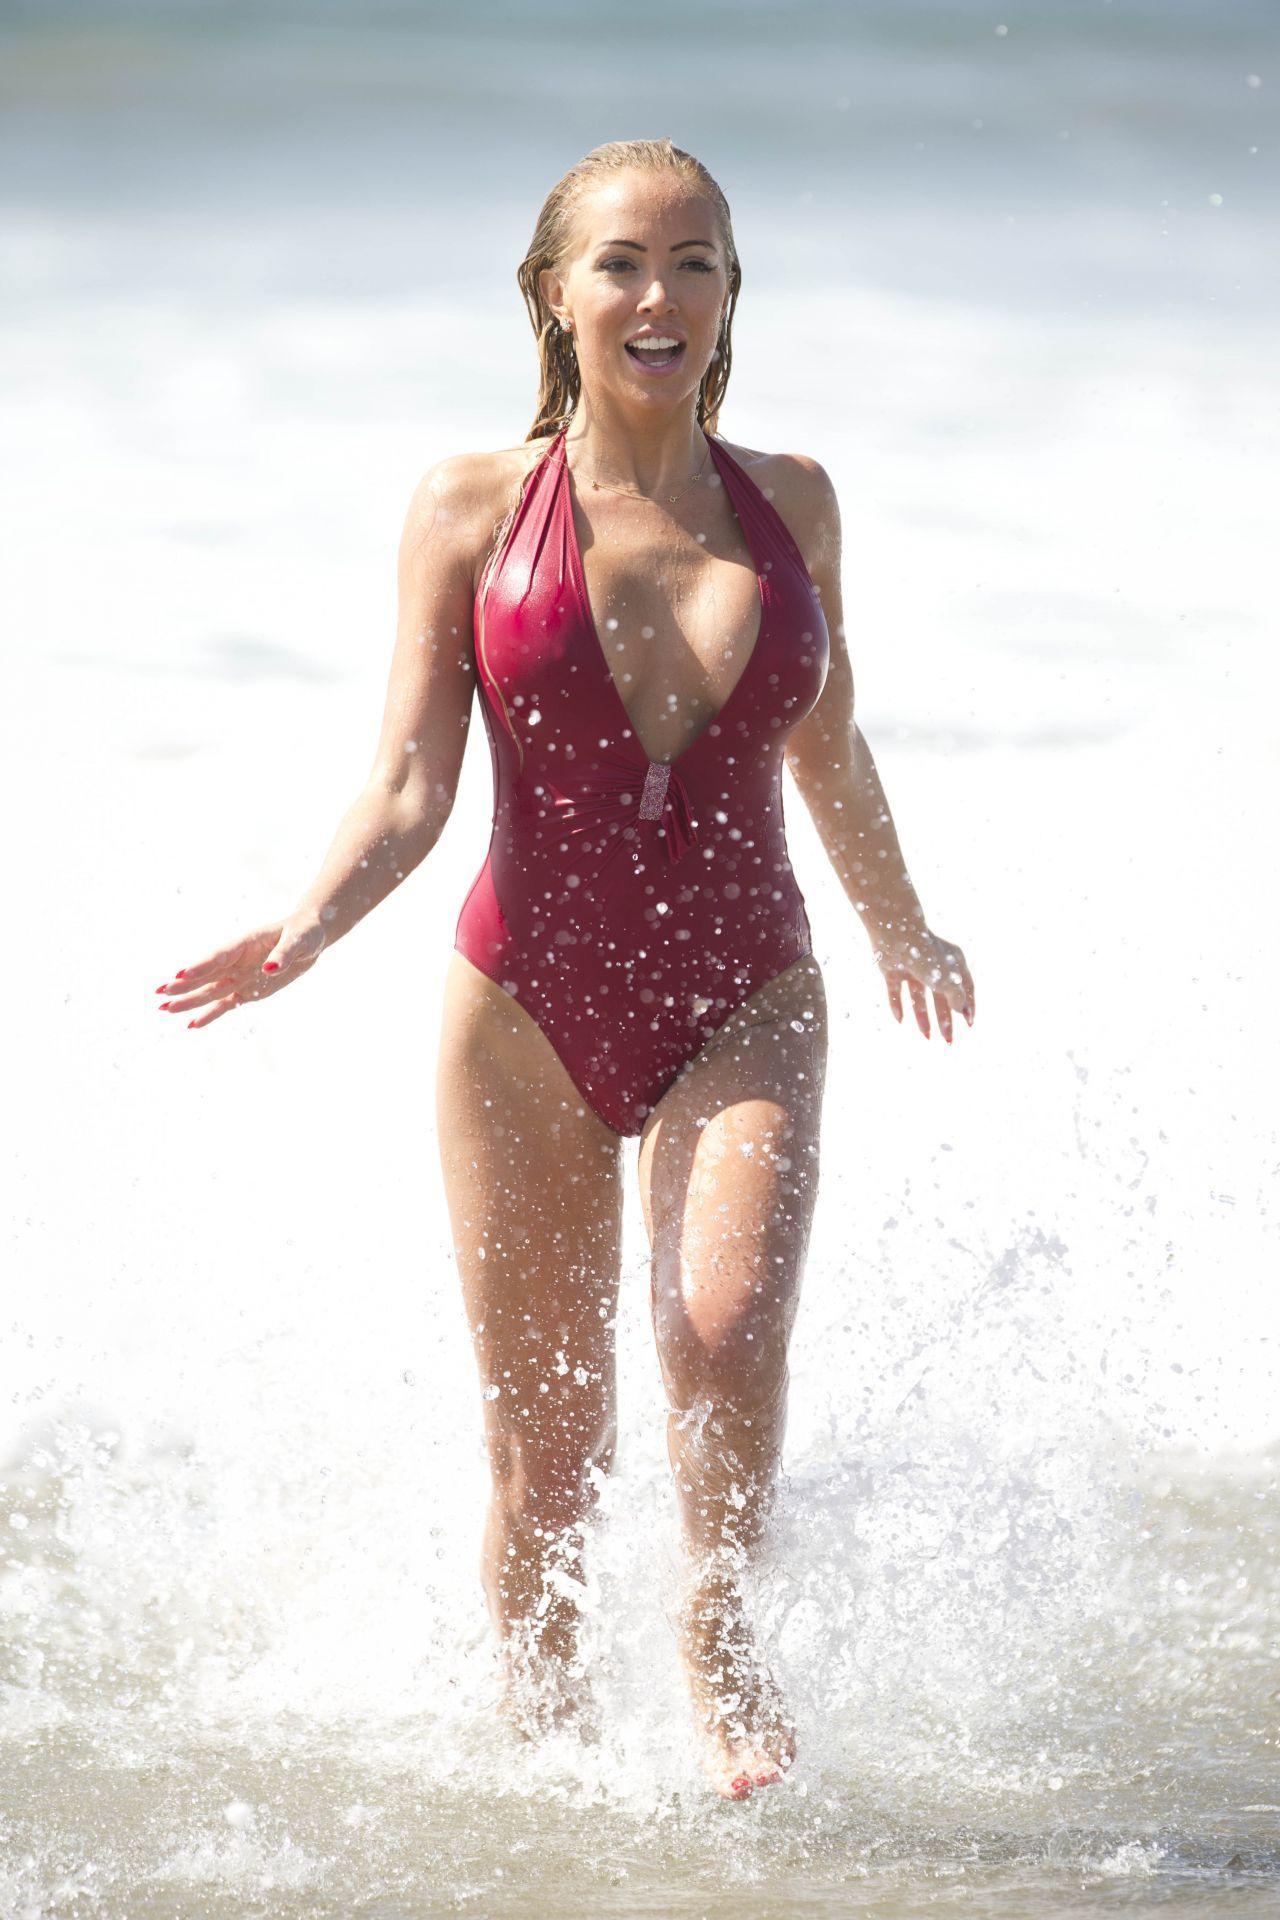 Topless Bikini Aisleyne Horgan-Wallace naked photo 2017